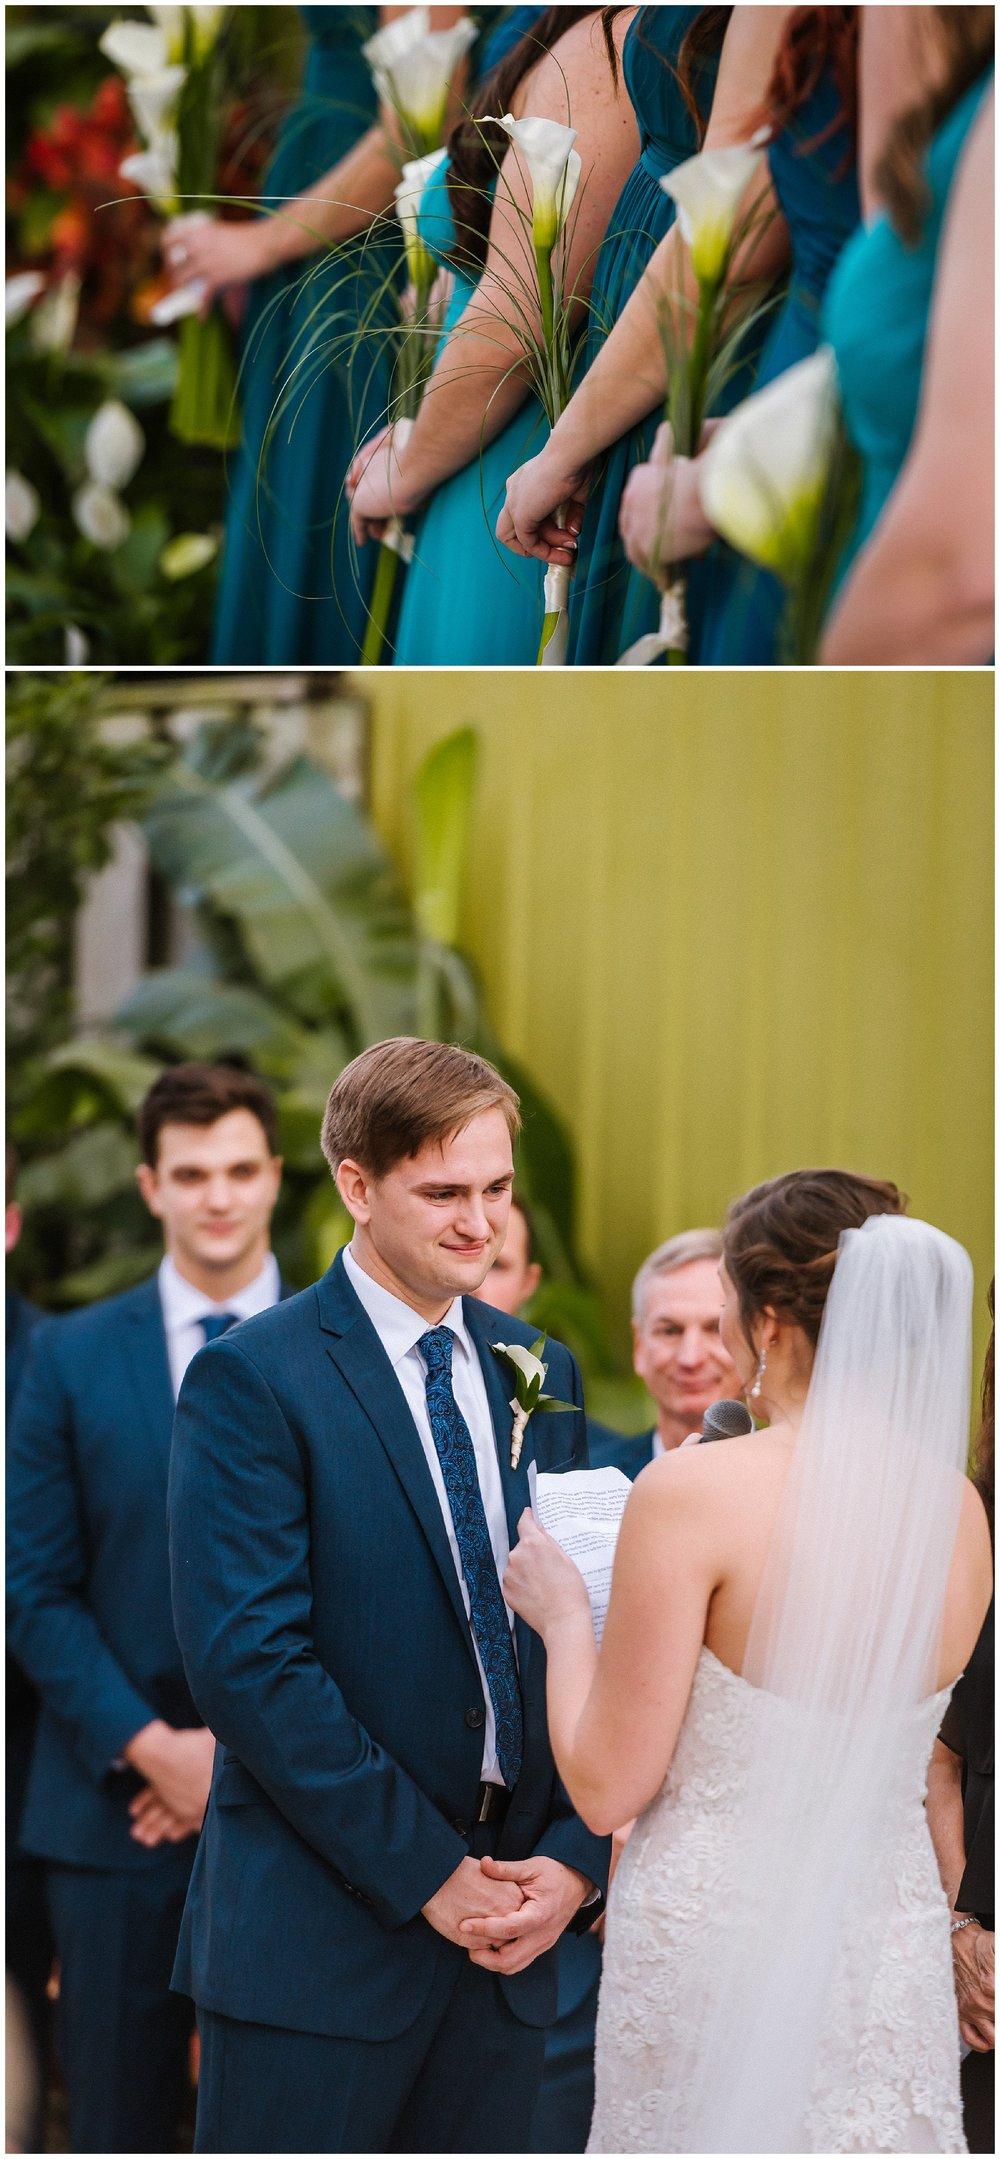 St-pete-wedding-photography-unique-glass-blowing-gallery-succulent-art_0029.jpg